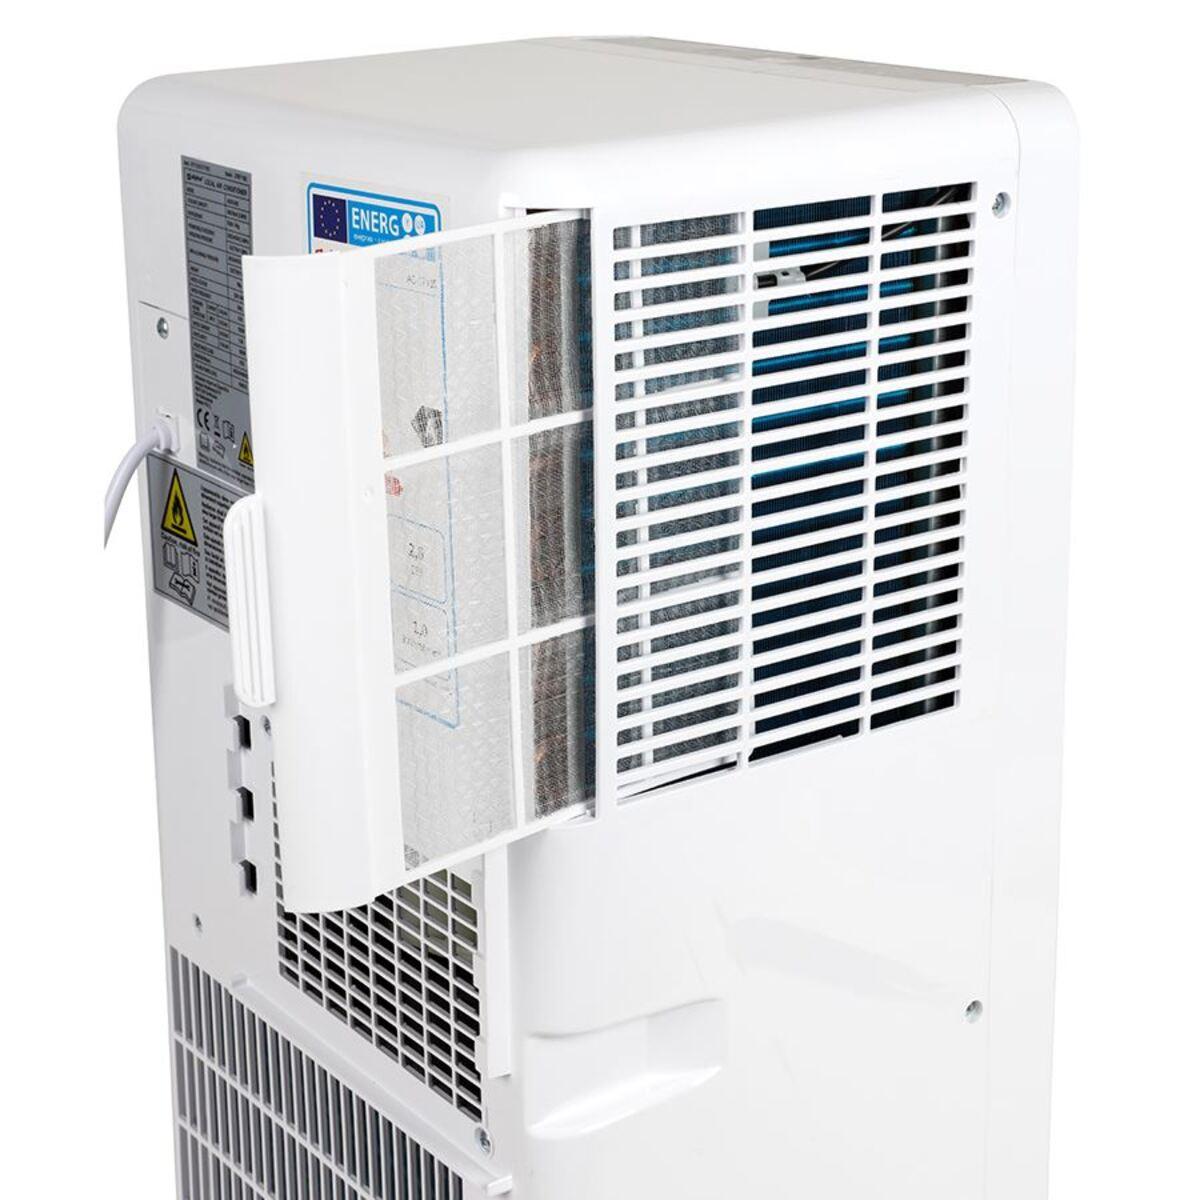 Bild 4 von Alpina Klimagerät A007G-09C 9000 BTU